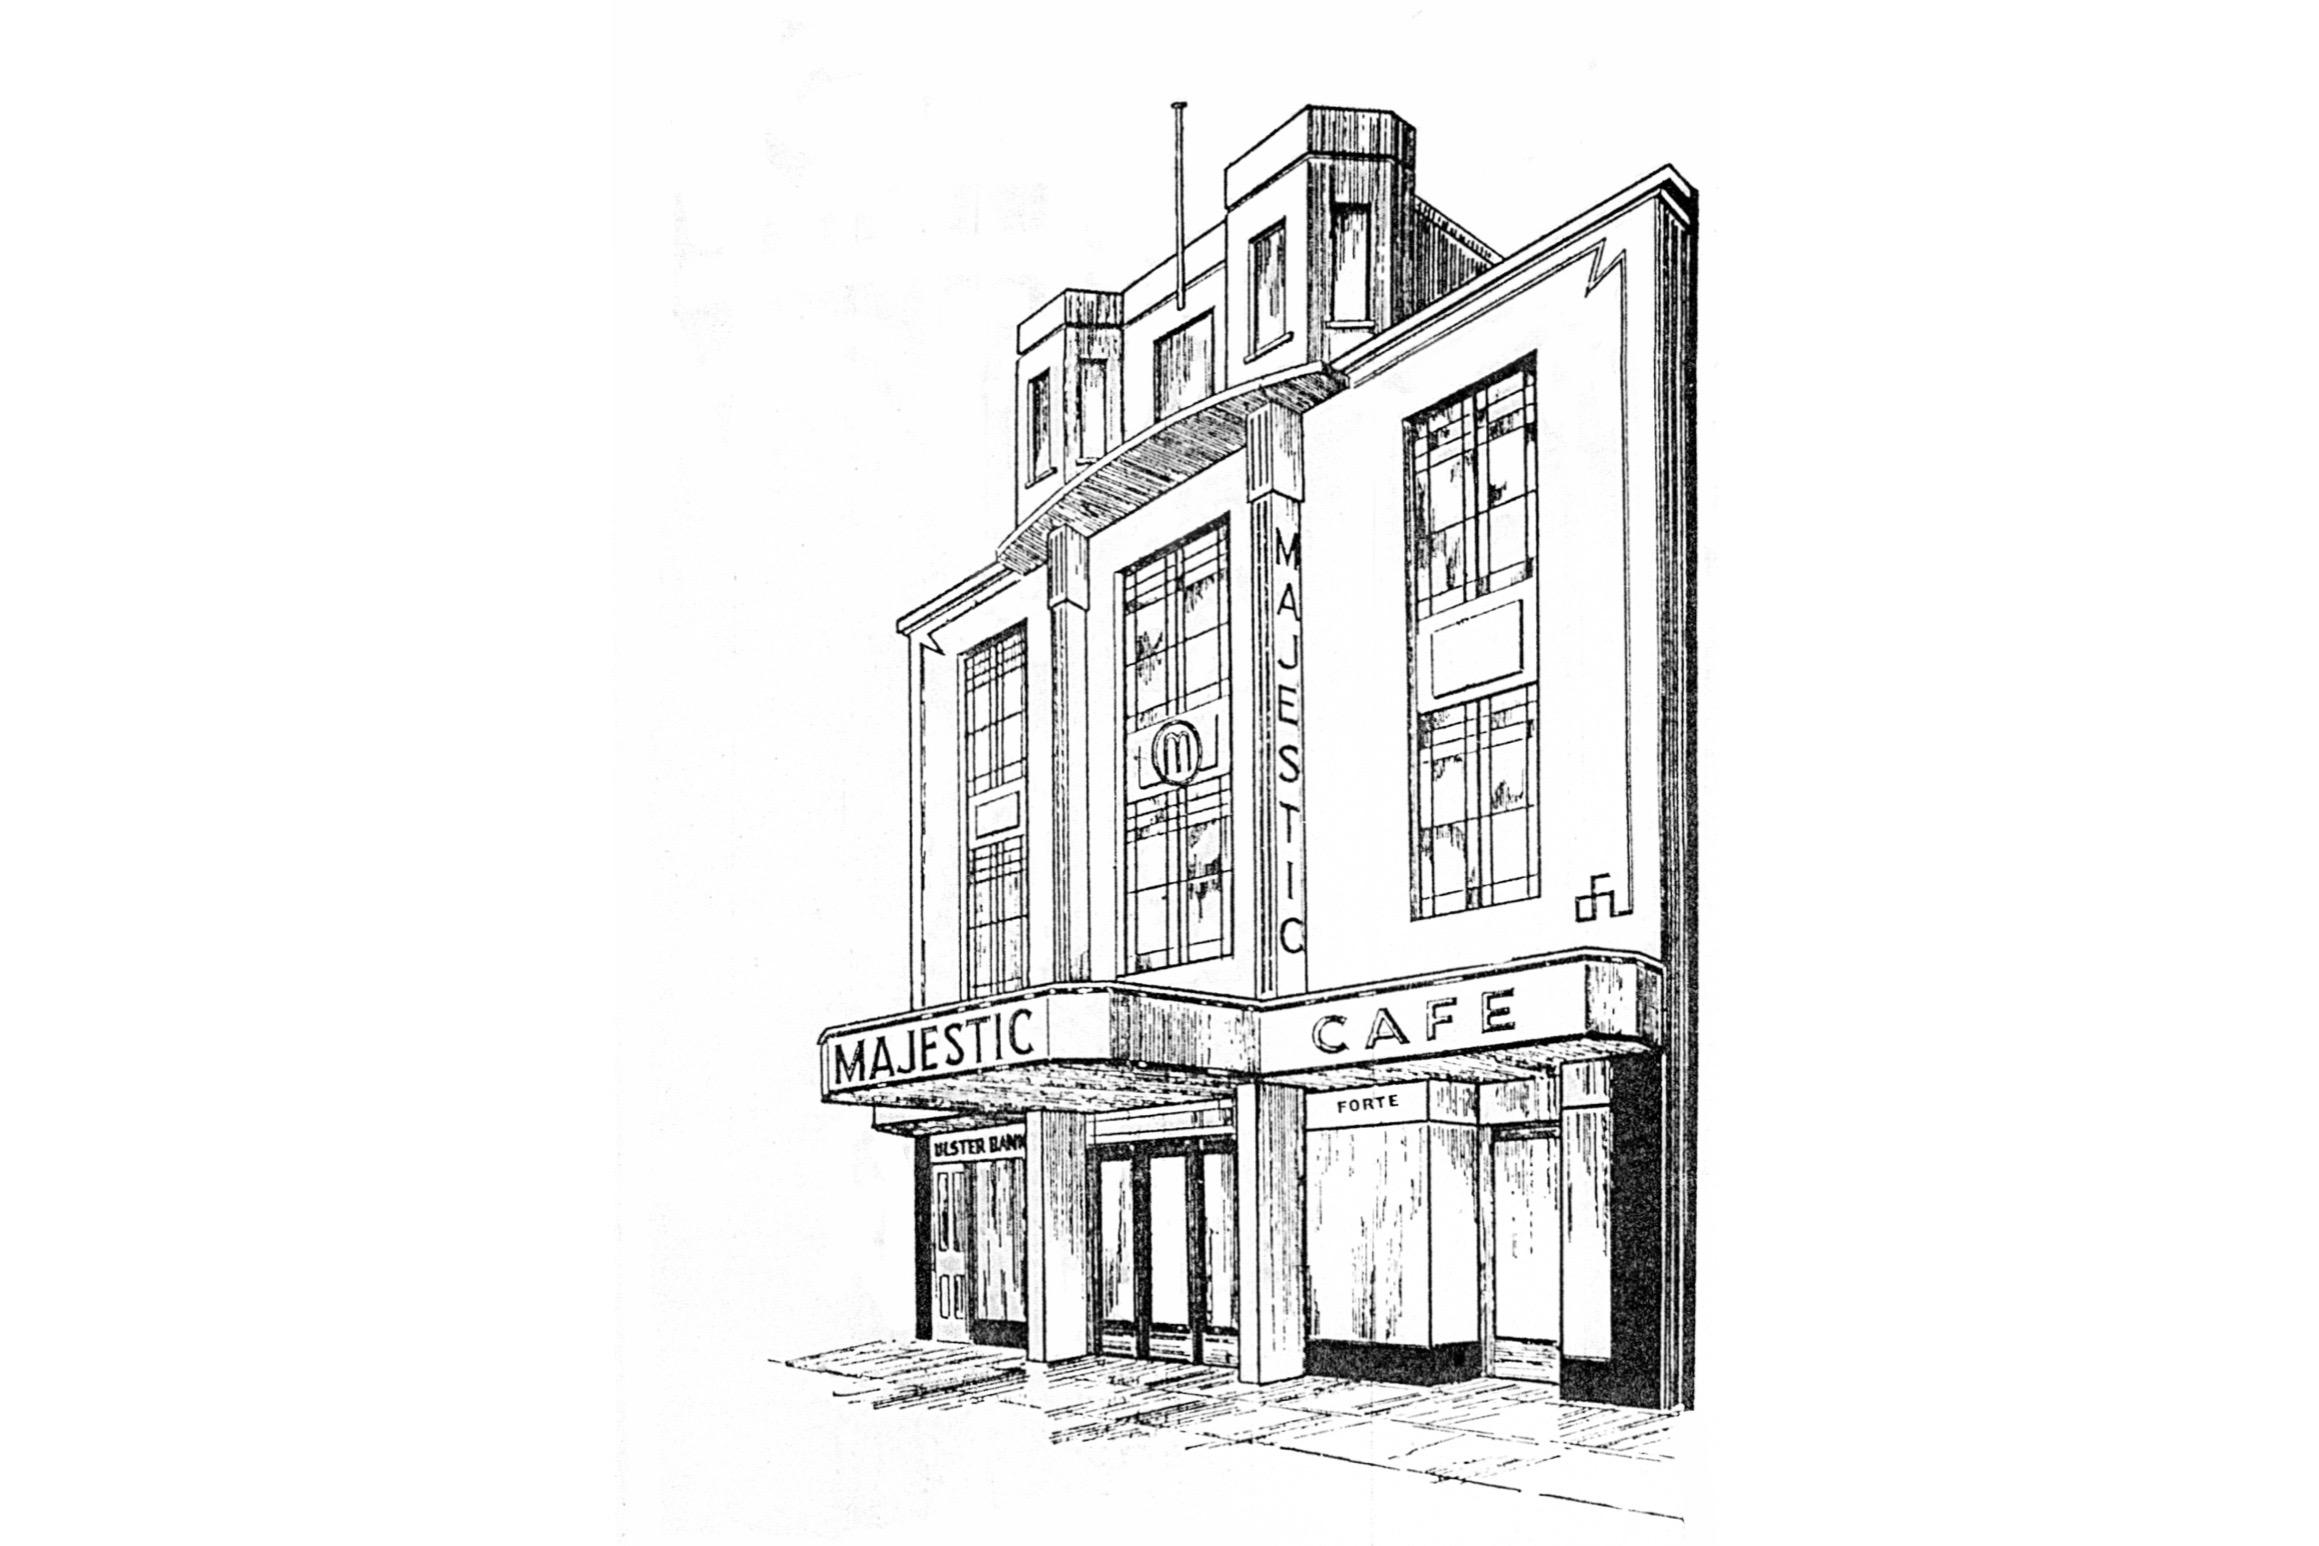 Portrush Majestic Cinema (Drawing)